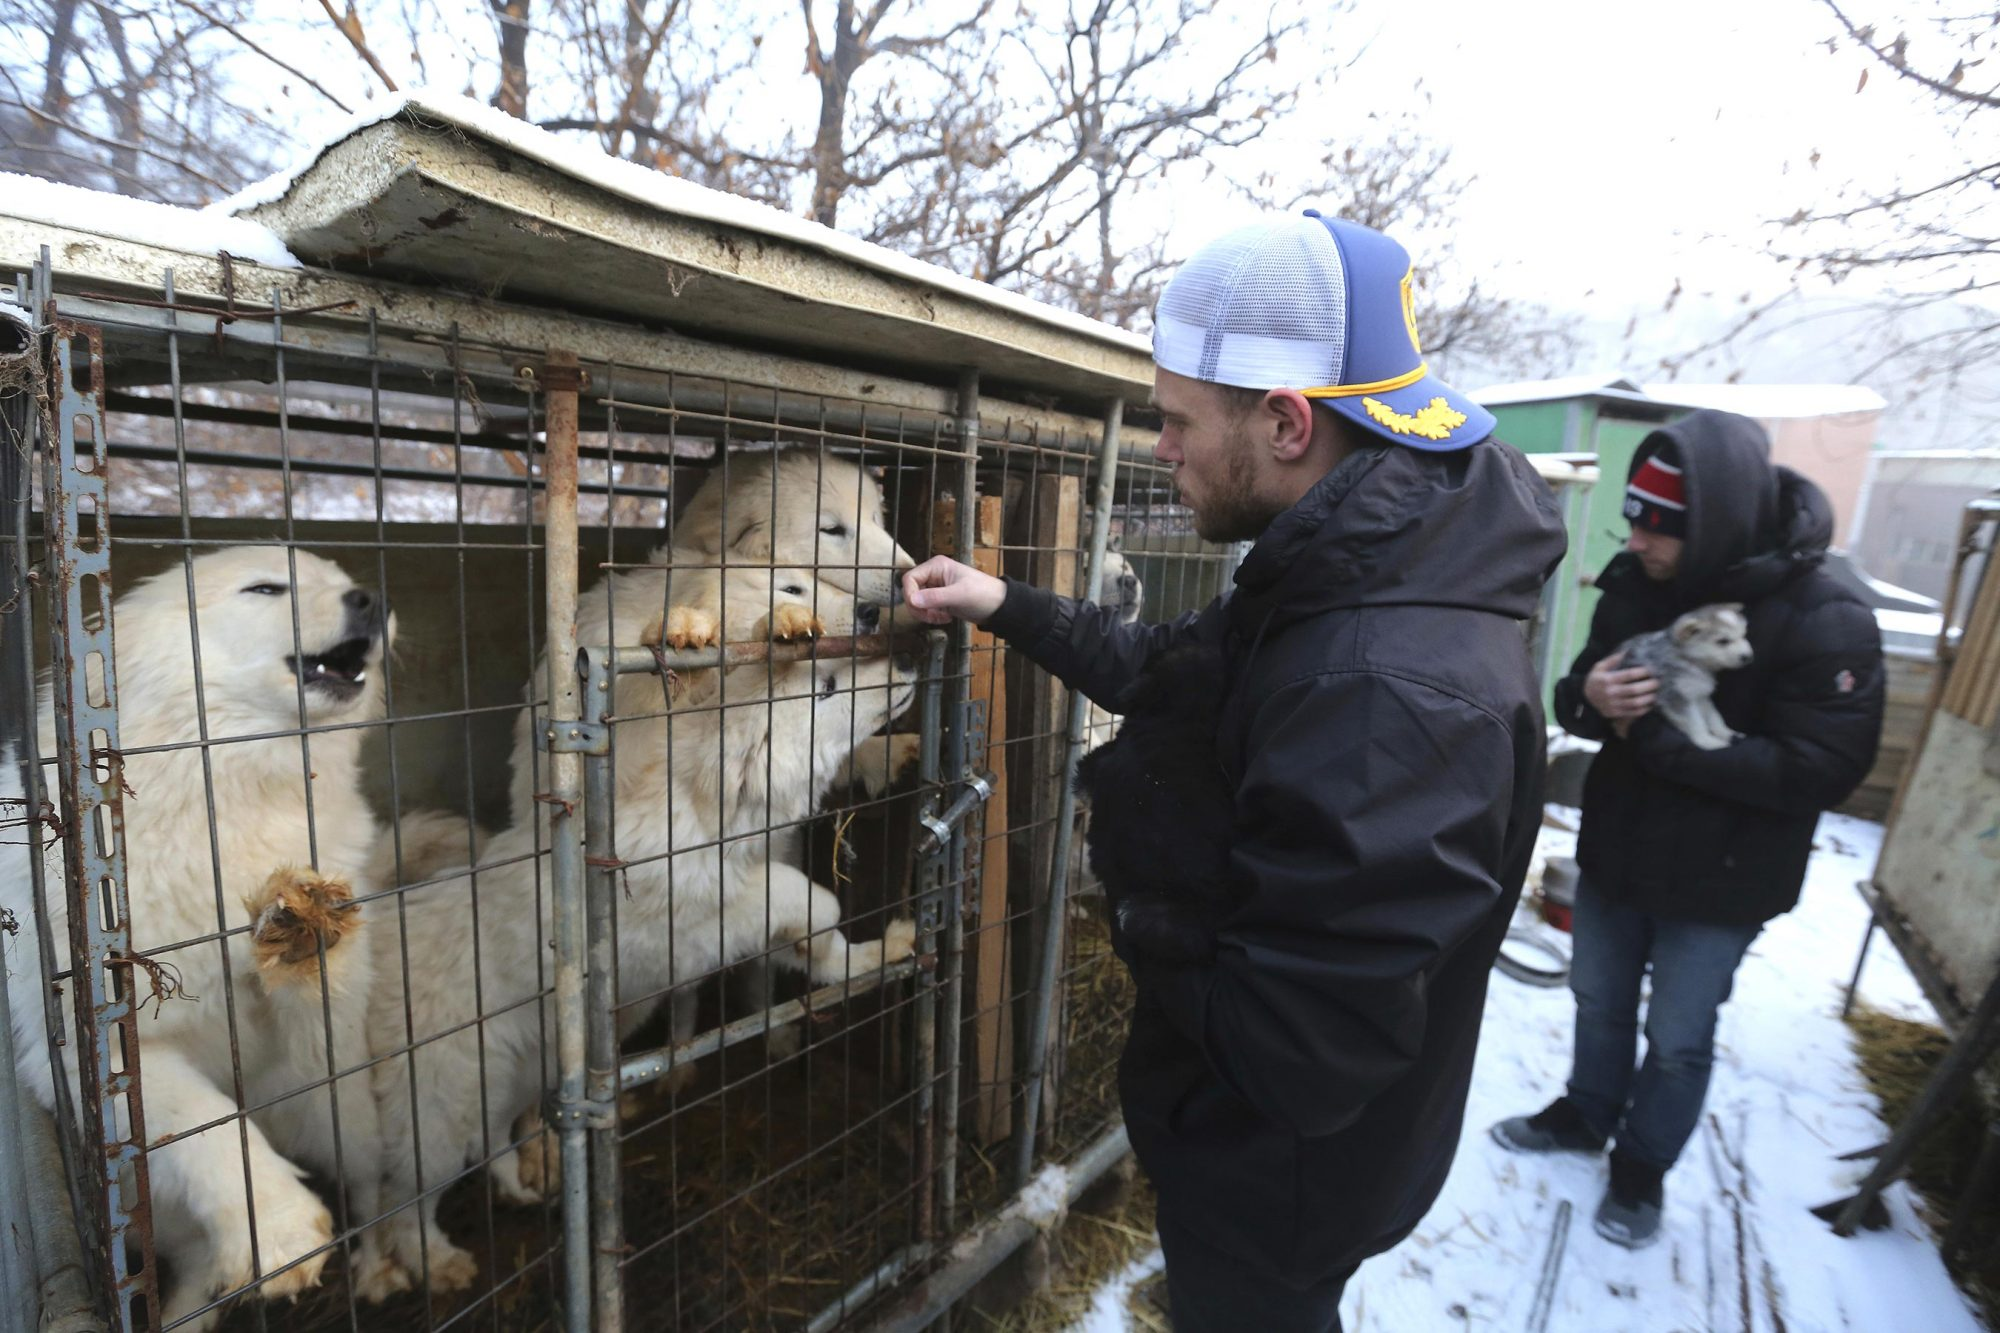 Kenworthy Korean Dog Rescue, Siheung, South Korea - 23 Feb 2018